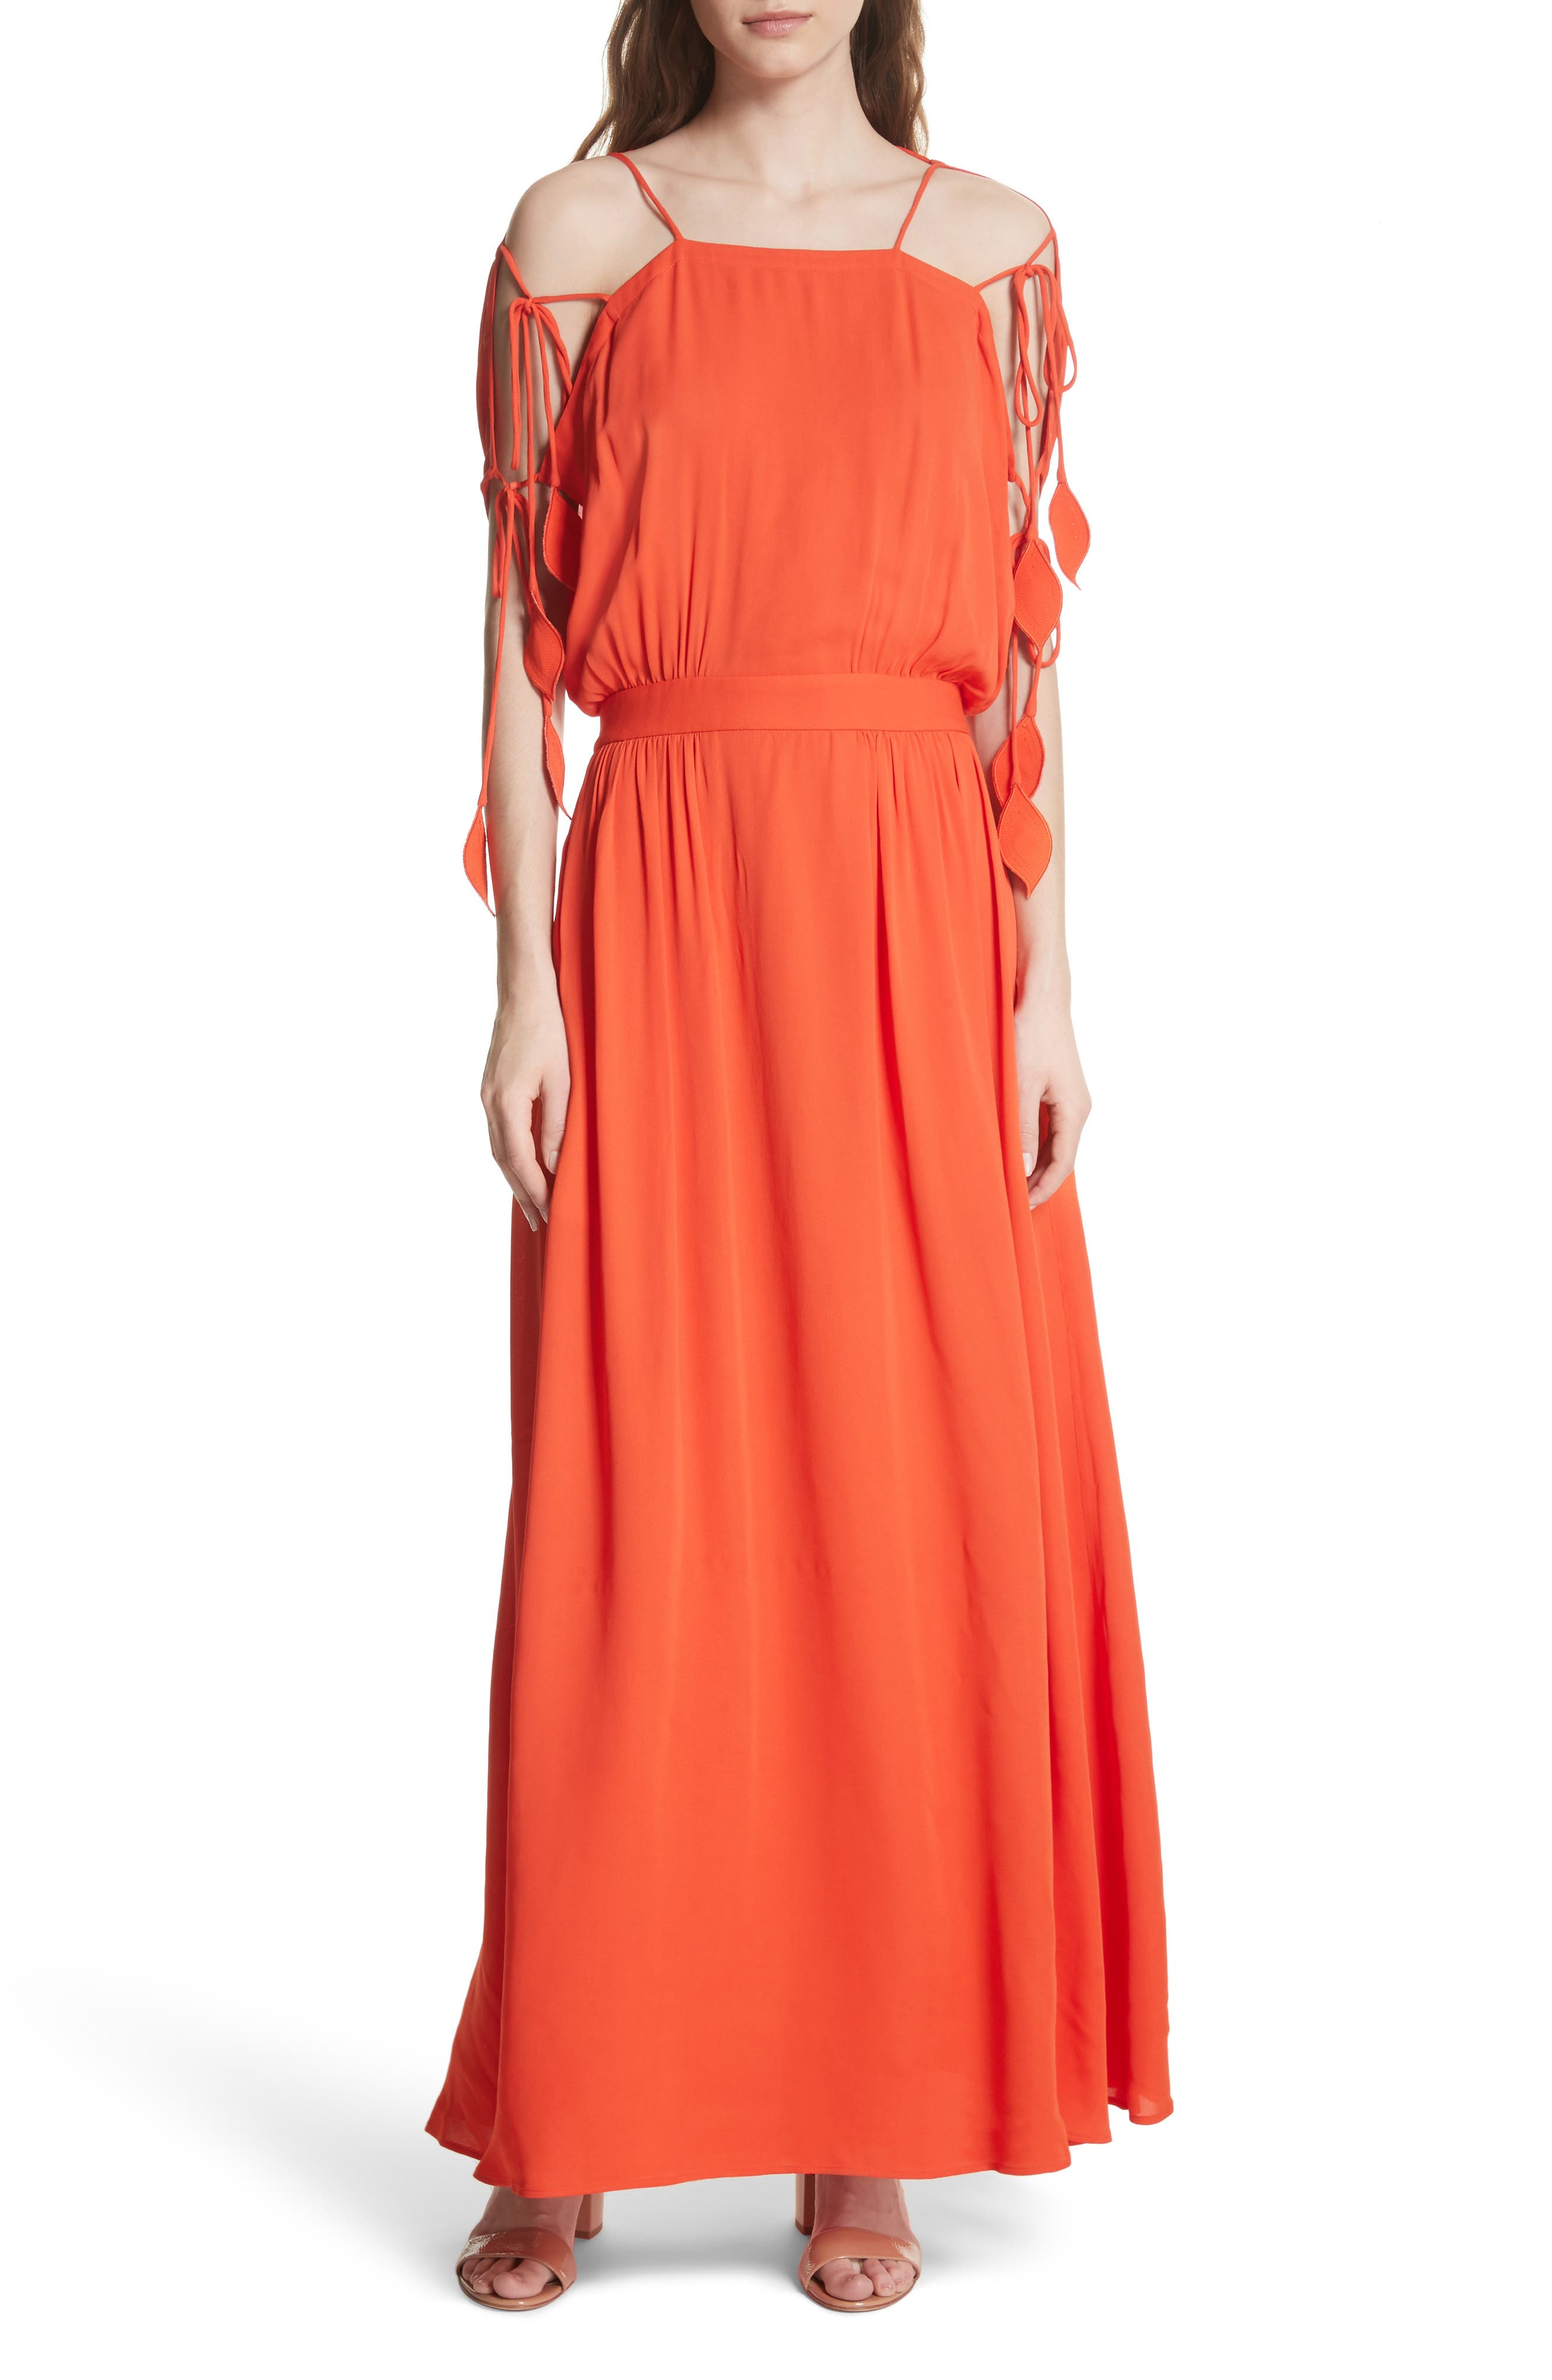 Tory Burch Evalene Maxi Dress